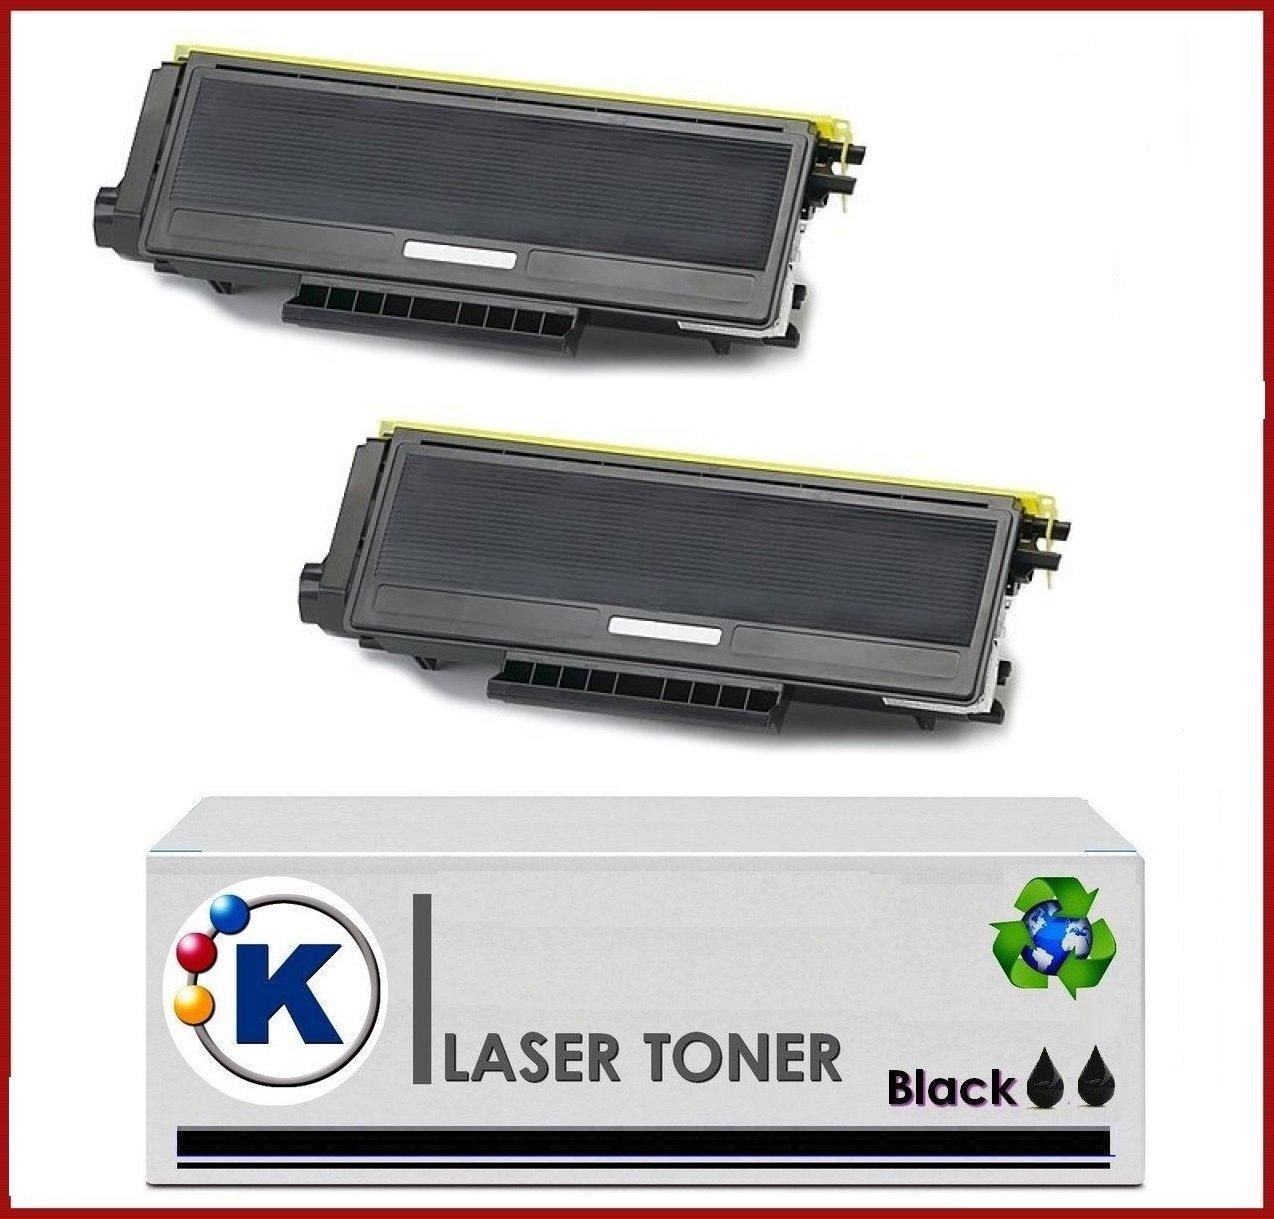 Brother TN3170 - 2 Toner COMPATIBLE TN-3170 , toner Laser Negro 2X 3170, toner TN-3170 , IMPRESORAS LASER:Hl/5240/5250Dn/5280Dw/5240L ...